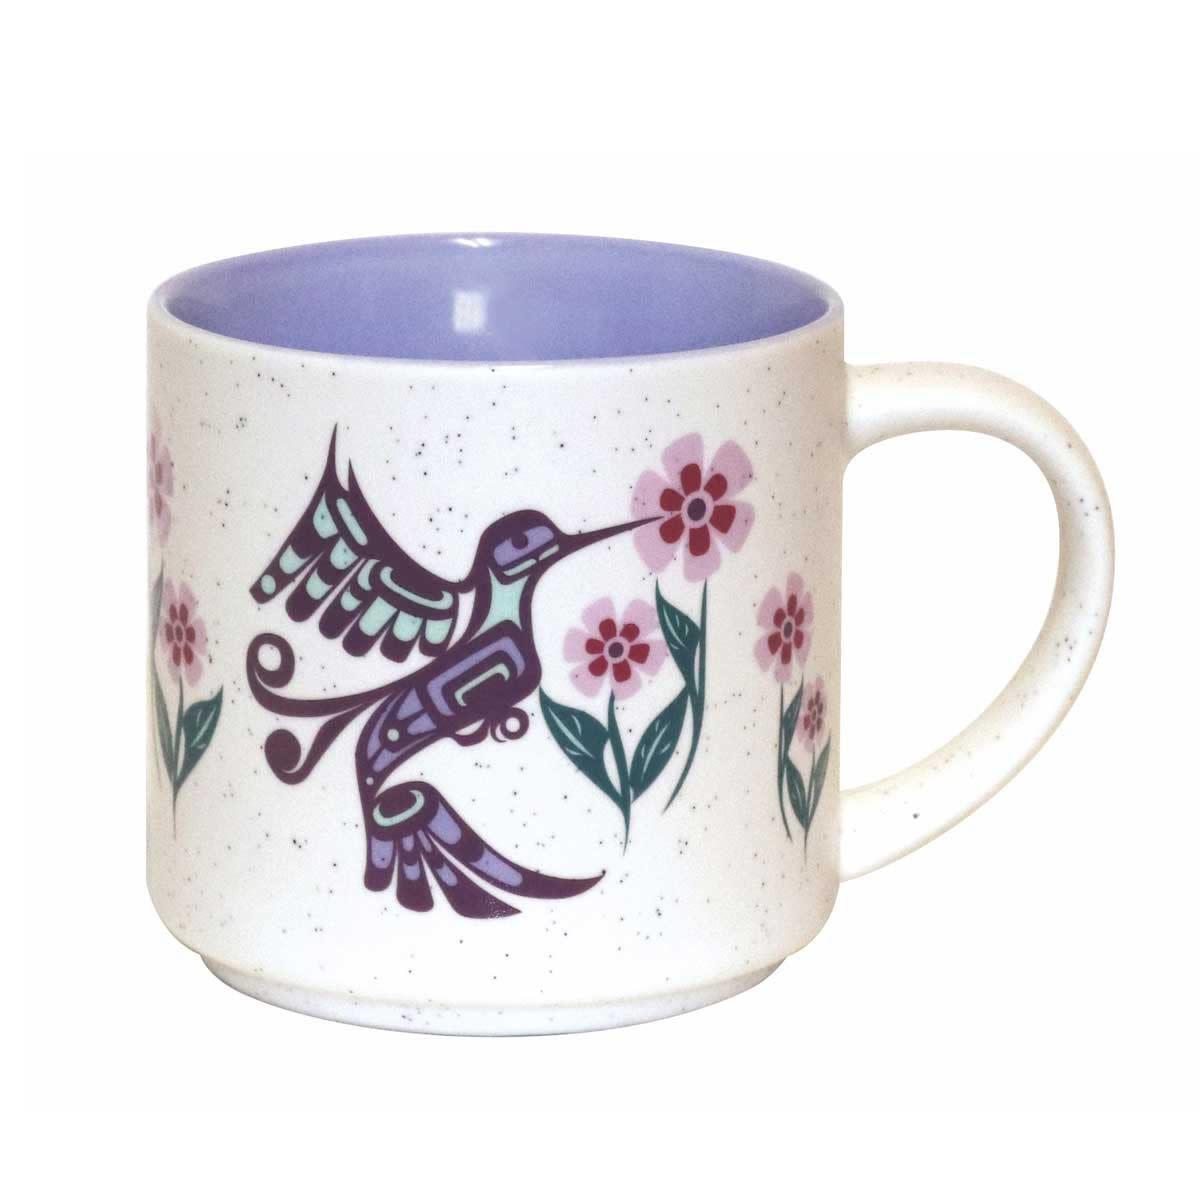 16 oz Ceramic Mug-6